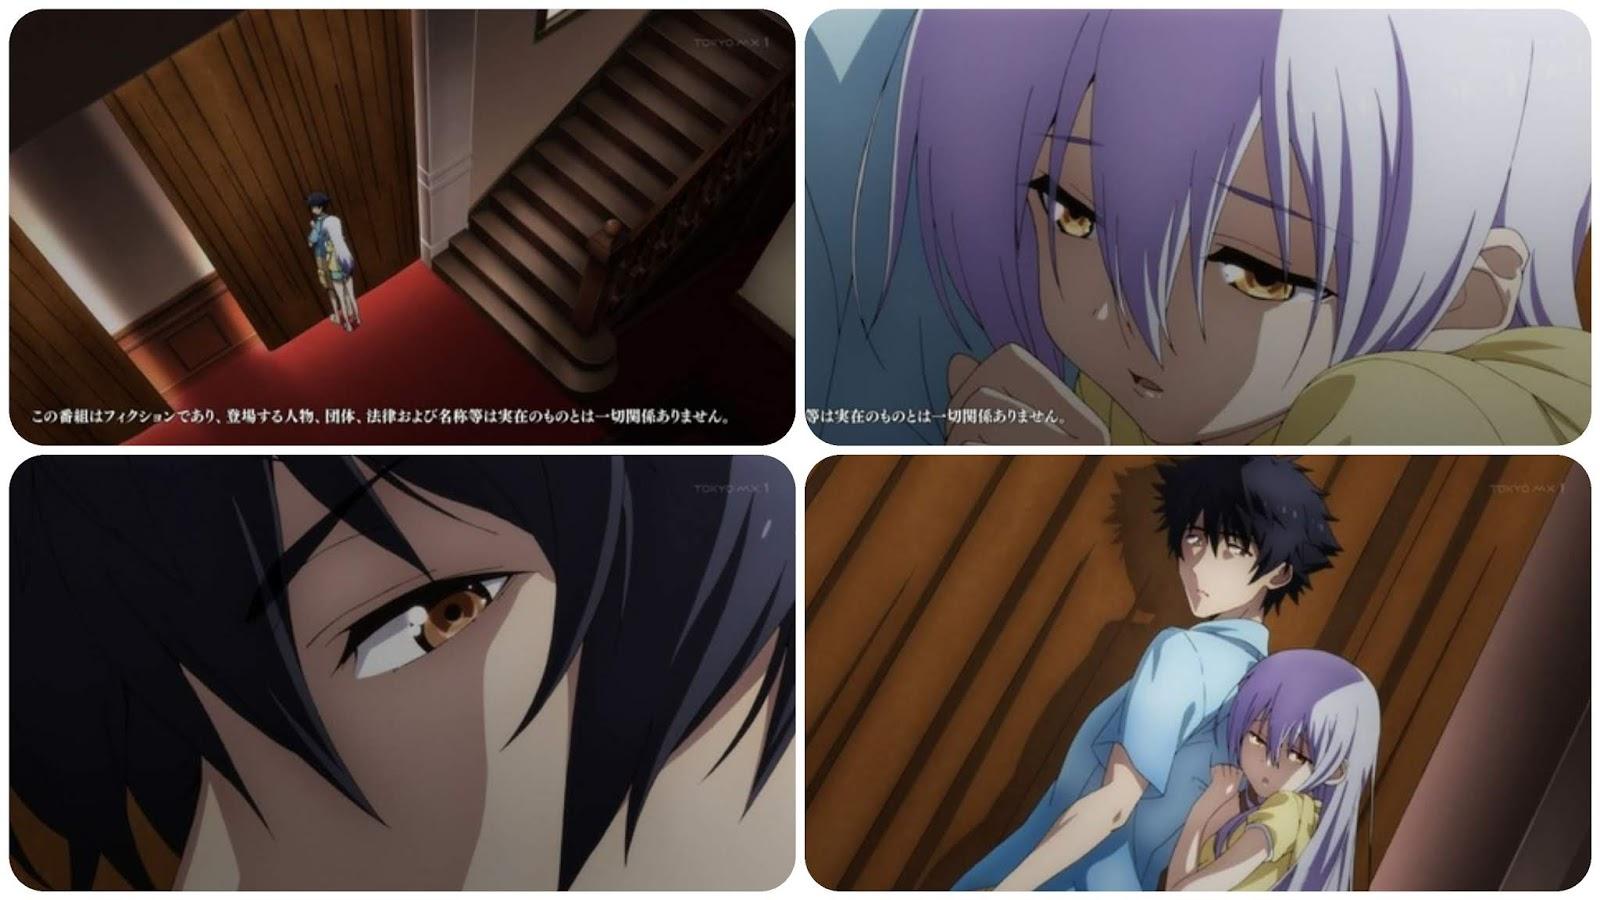 Anime Nikki: [Island] Episode 2 everyone's impressions